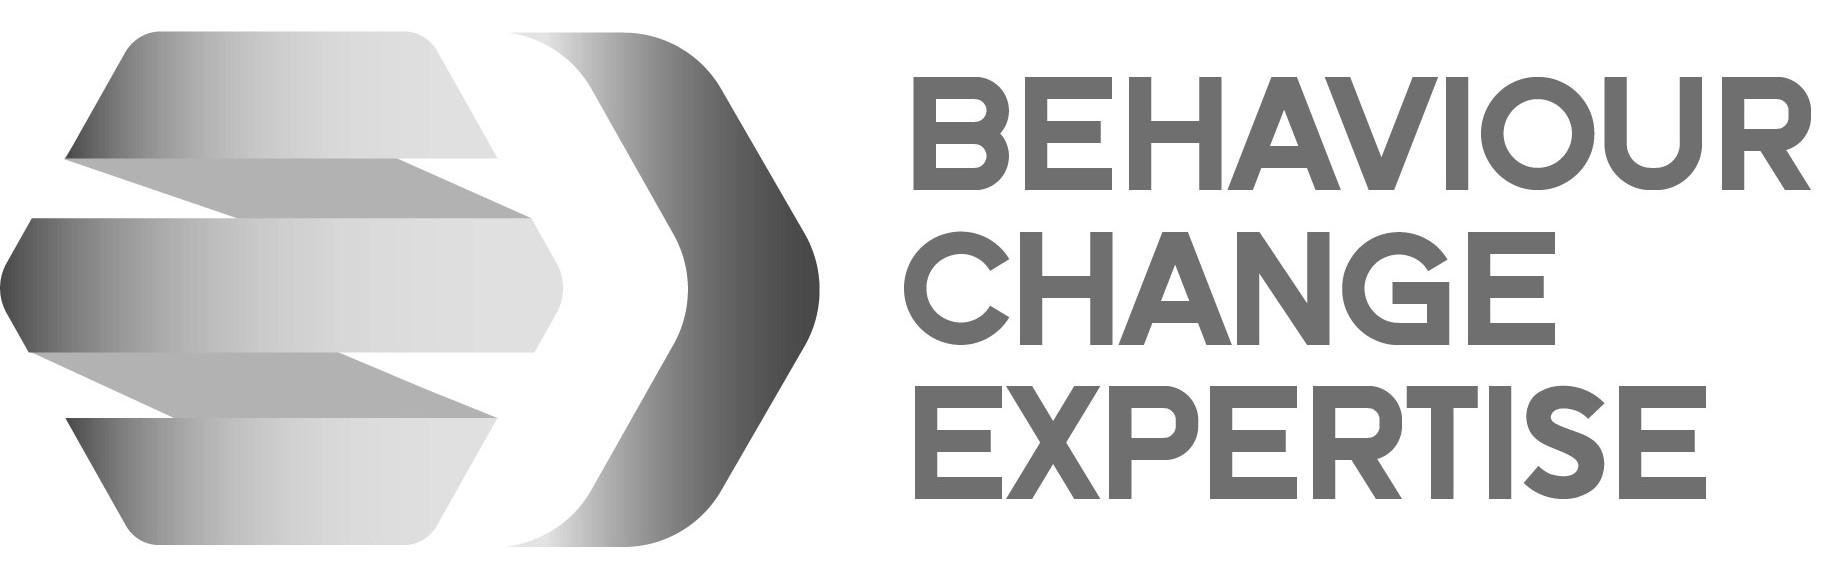 Behaviour Change Expertise